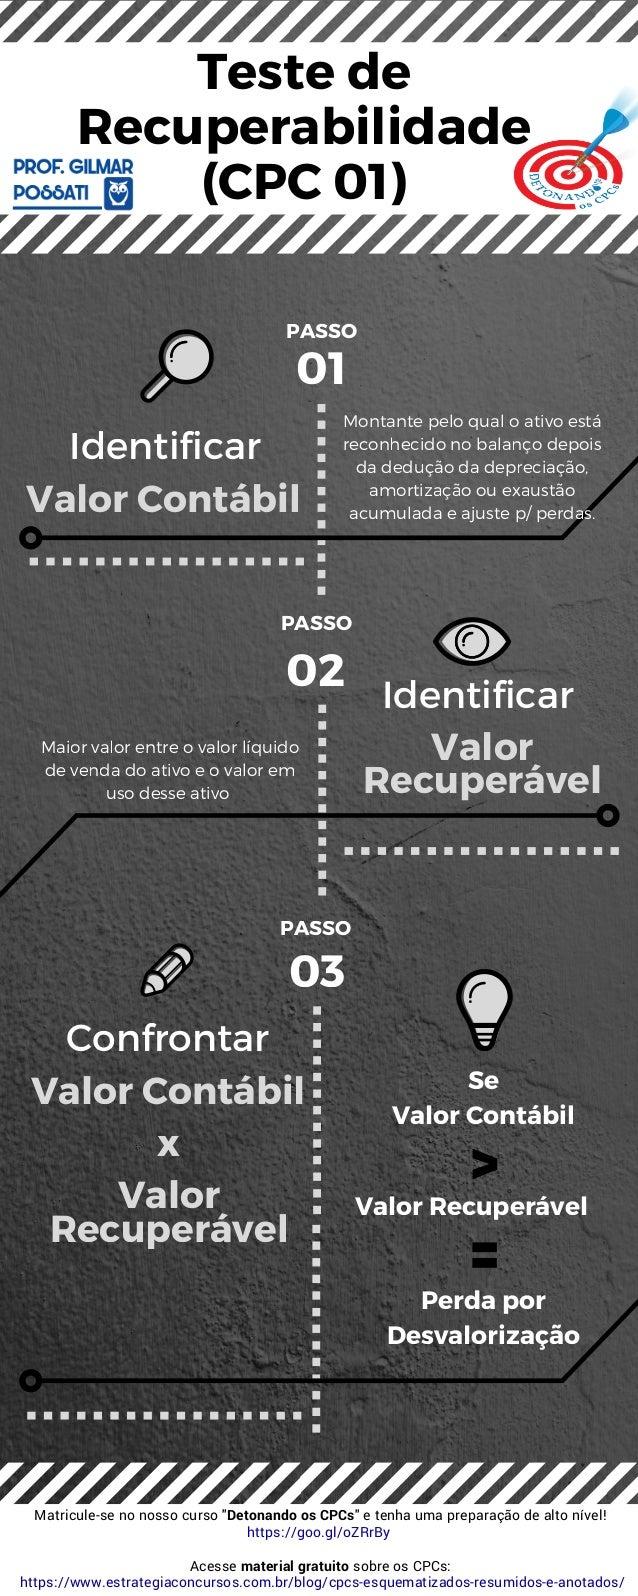 Valor Contábil Valor Contábil x Valor Recuperável Valor Recuperável 03 01 02 Identificar Identificar Confrontar PASSO PA...